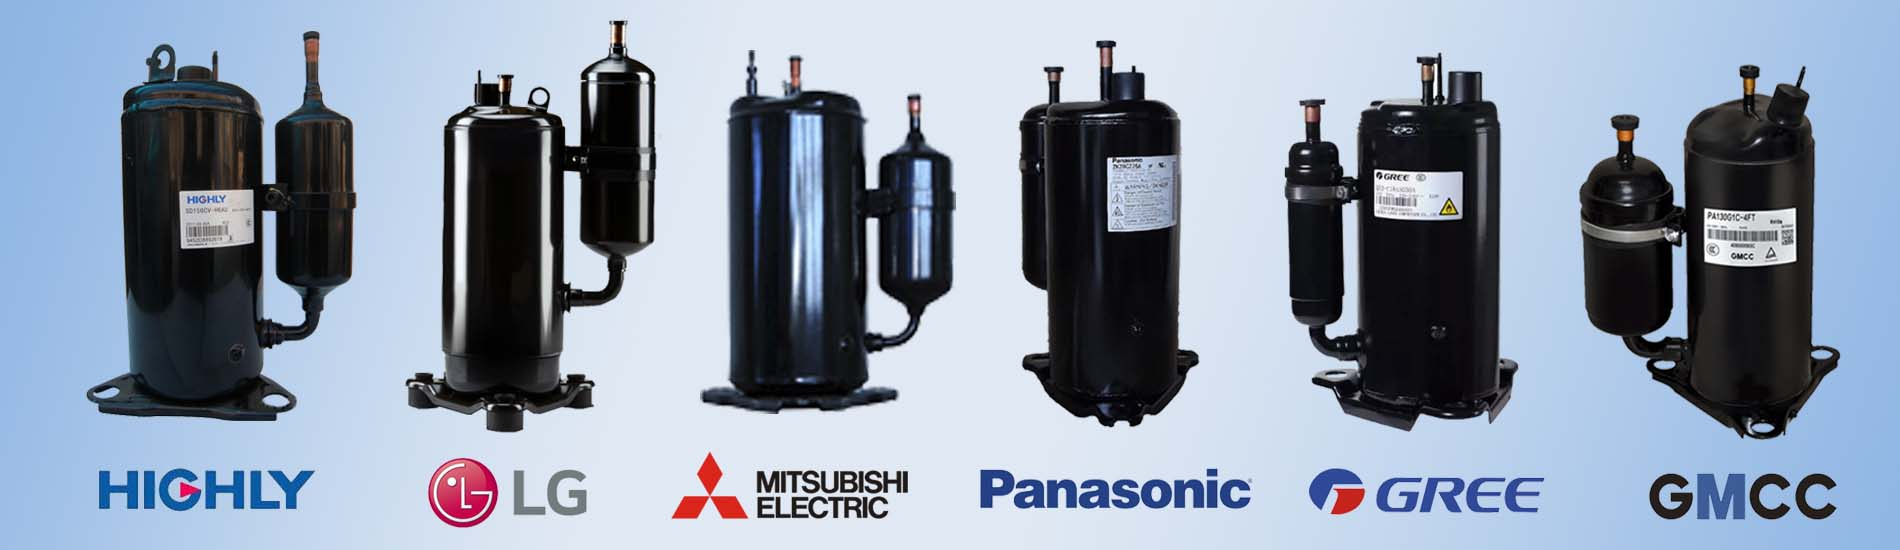 LG-GMCC-Panasonic-GREE-Landa-HIGHLY-Hitachi-BOYANG-BOYARD-Mitsubishi-Rotary-Compressor